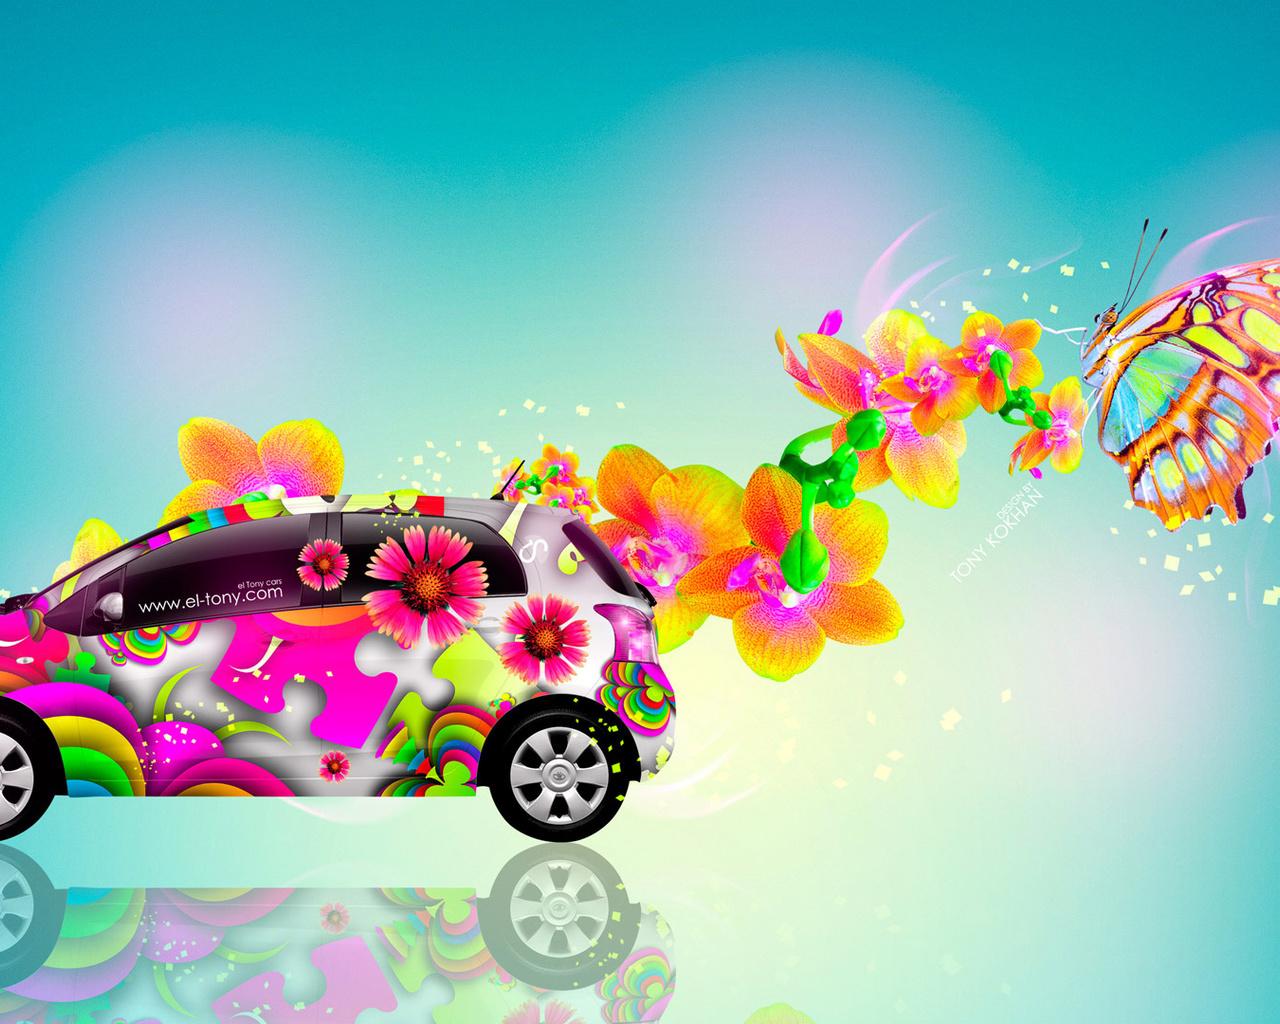 tony kokhan, toyota, vitz, jdm, side, abstract, aerography, fantasy, butterfly, flowers, car, multicolors, blue, yellow, el tony cars, photoshop, design, art, style, hd wallpapers, тони кохан, фотошоп, дизайн, тойота, витц, вид сбоку, аэрография, абстракт